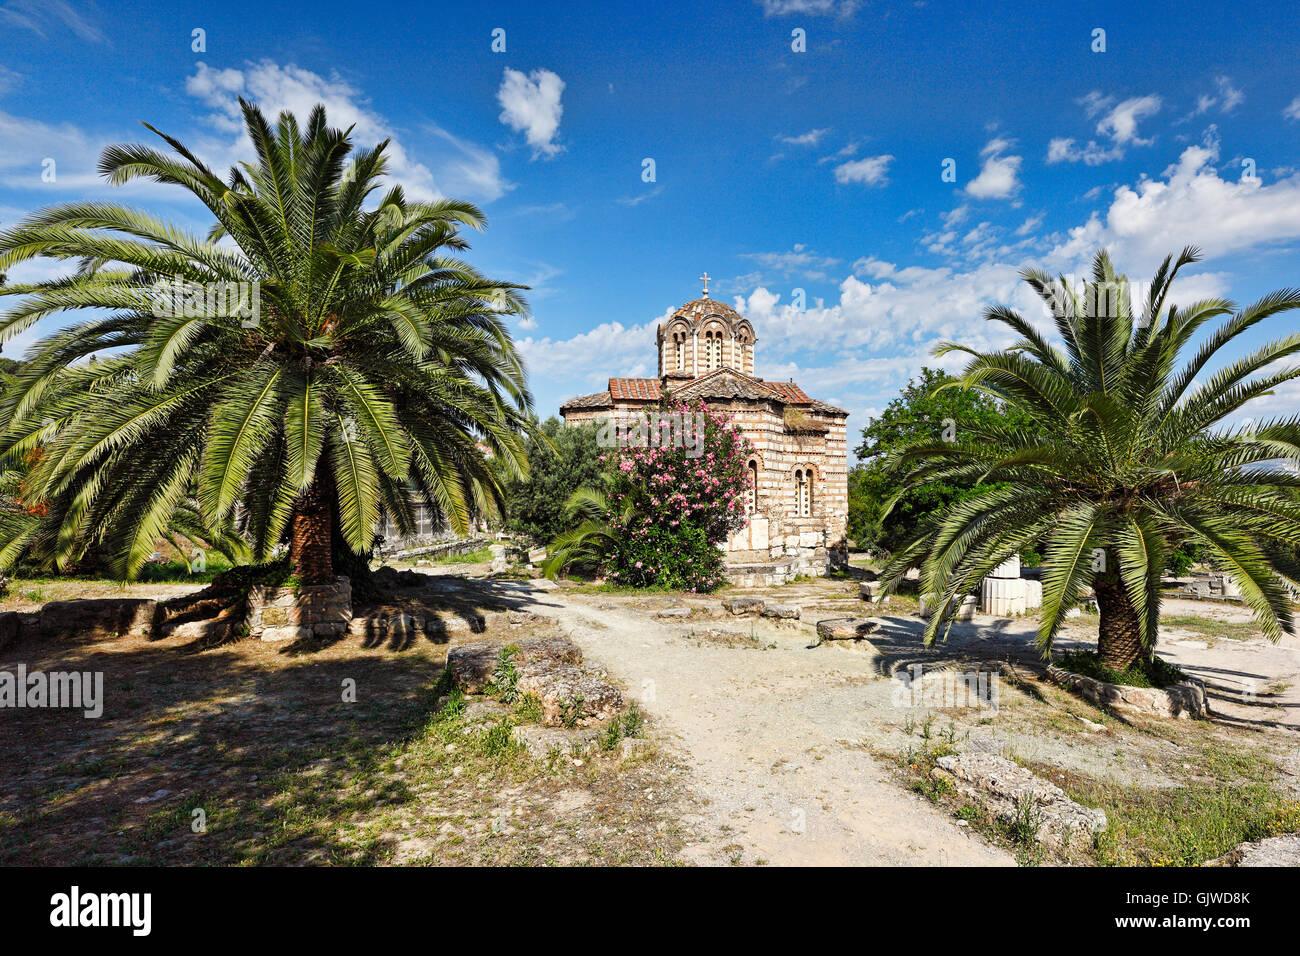 Église Agii Apostoli Solaki (10e c. A.D.) dans l'ancienne agora d'Athènes, Grèce Photo Stock